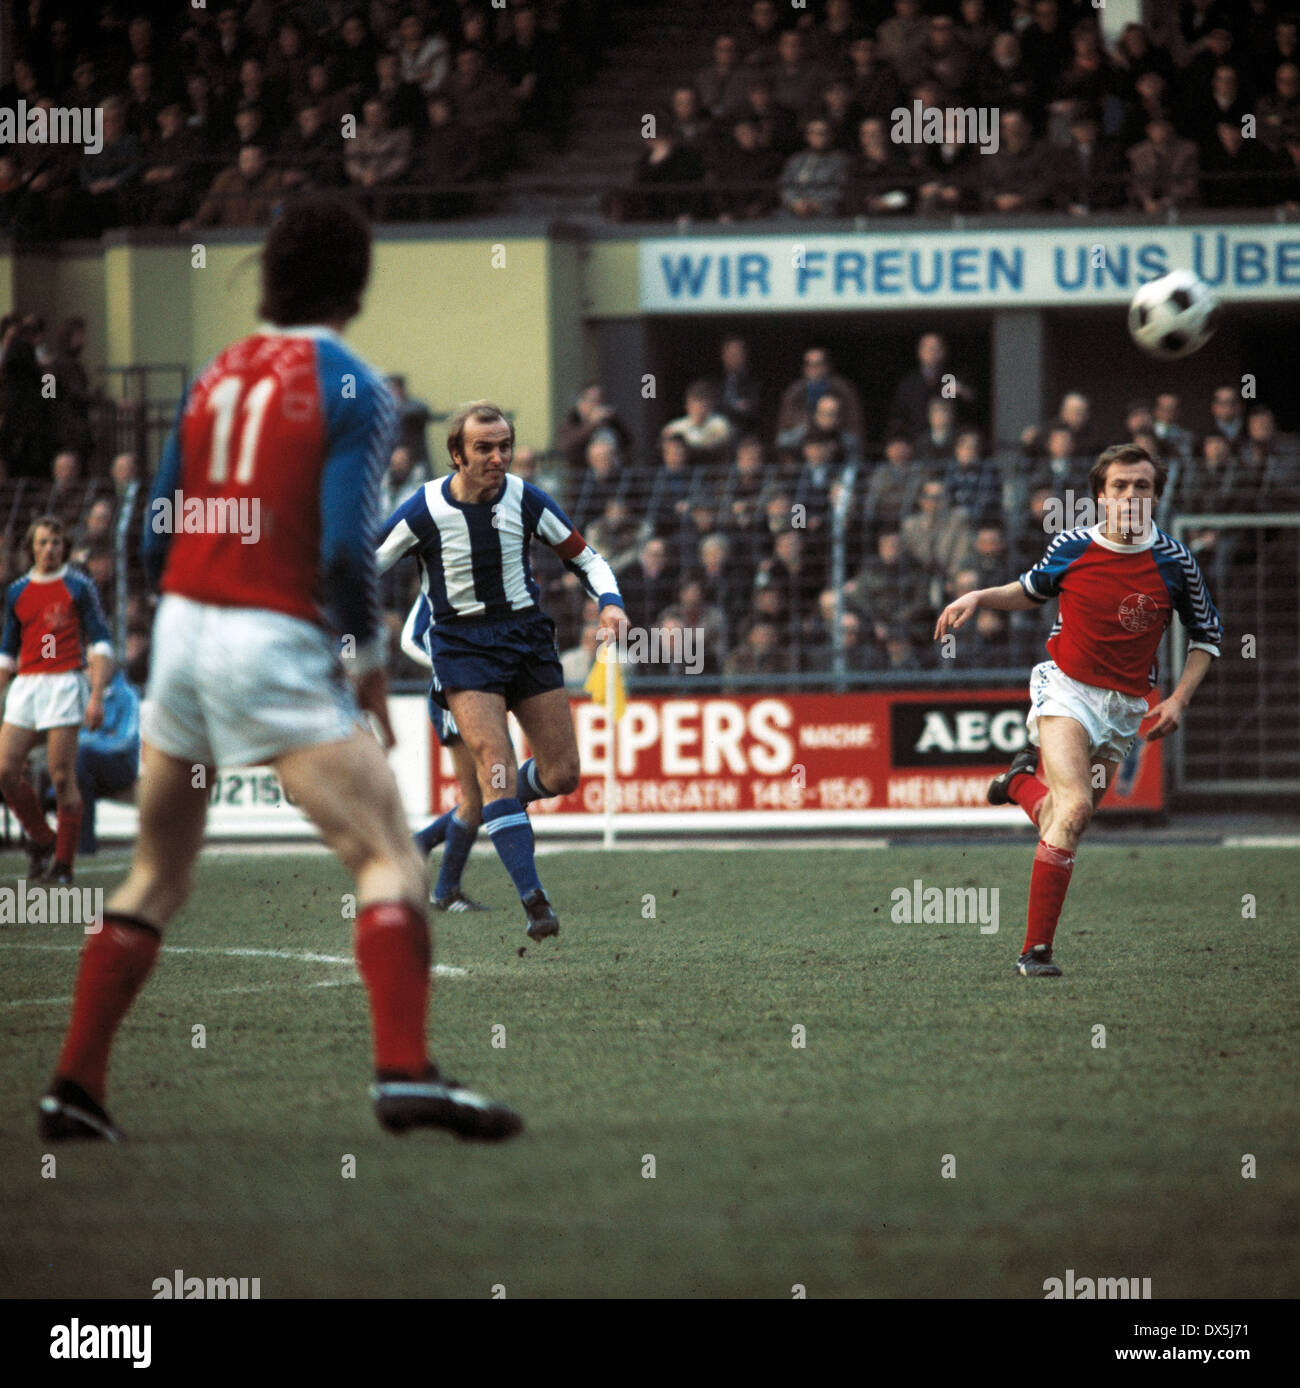 football, Bundesliga, 1975/1976, Grotenburg Stadium, FC Bayer 05 Uerdingen versus Hertha BSC Berlin 1:1, scene of the match, long-range shot by team leader Erich Beer (Hertha), right Horst Riege (05) - Stock Image